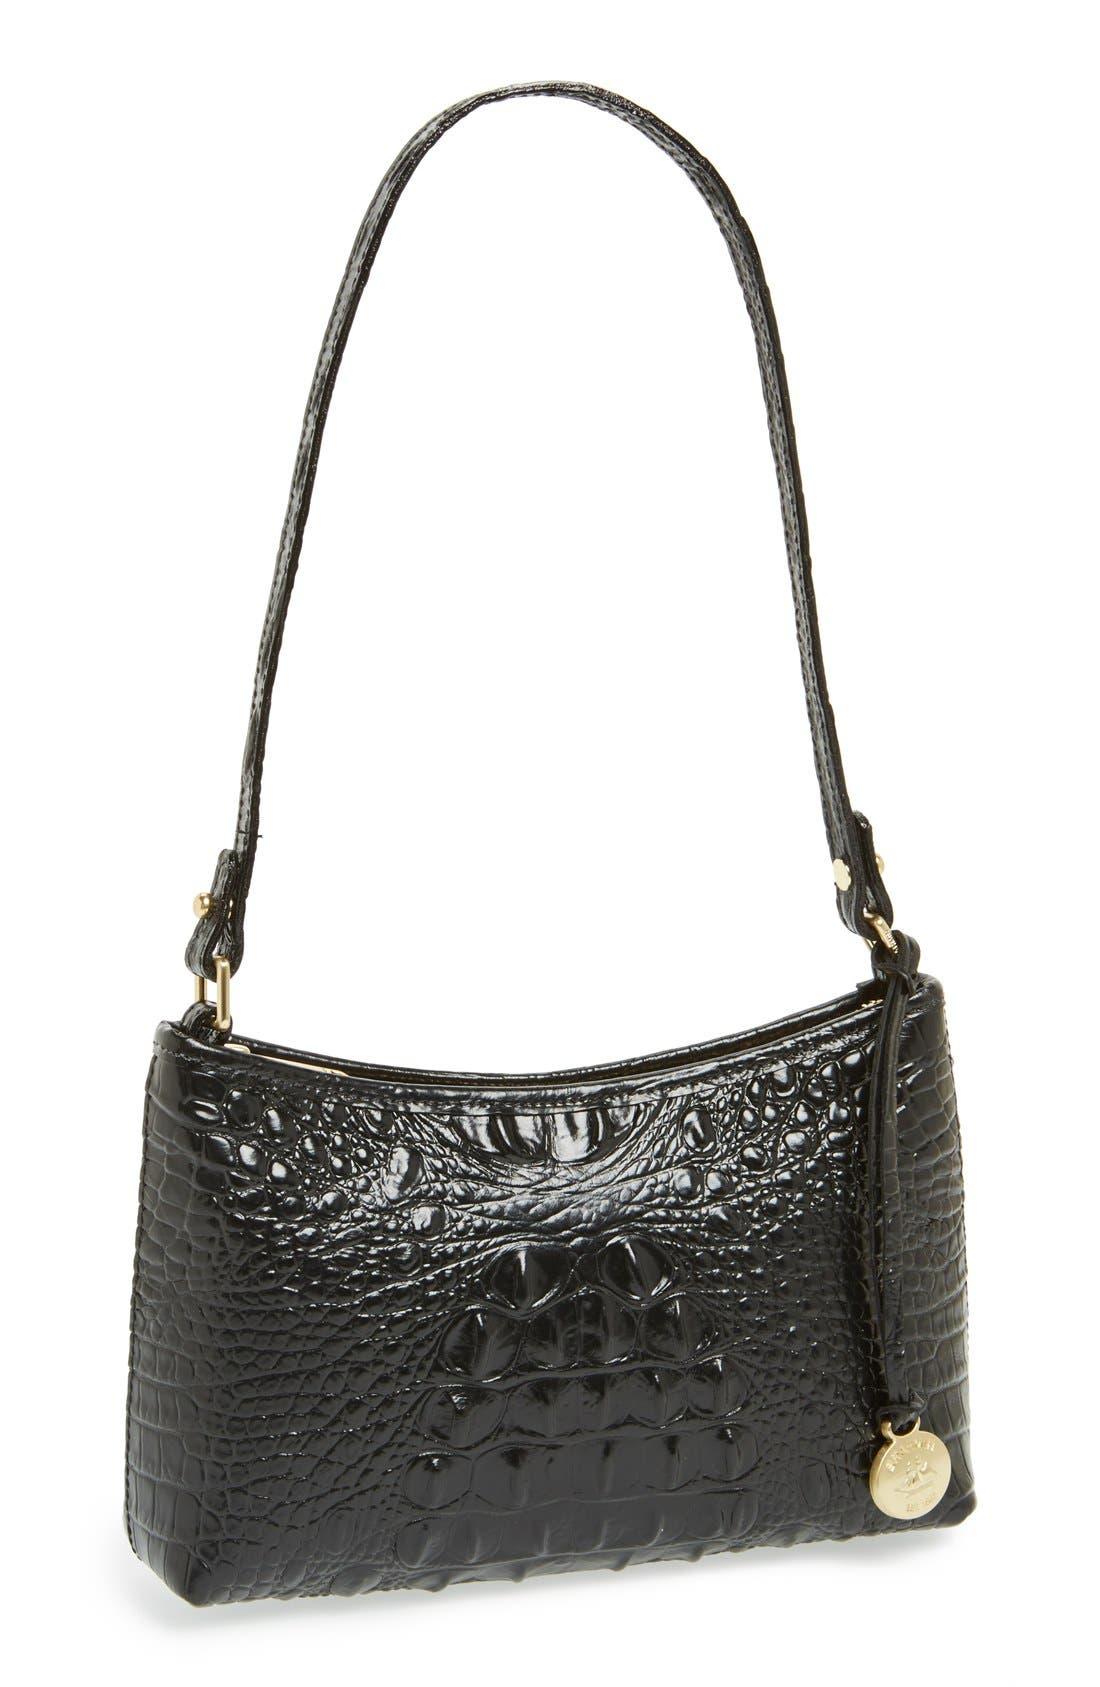 Main Image - Brahmin 'Anytime - Mini' Convertible Handbag